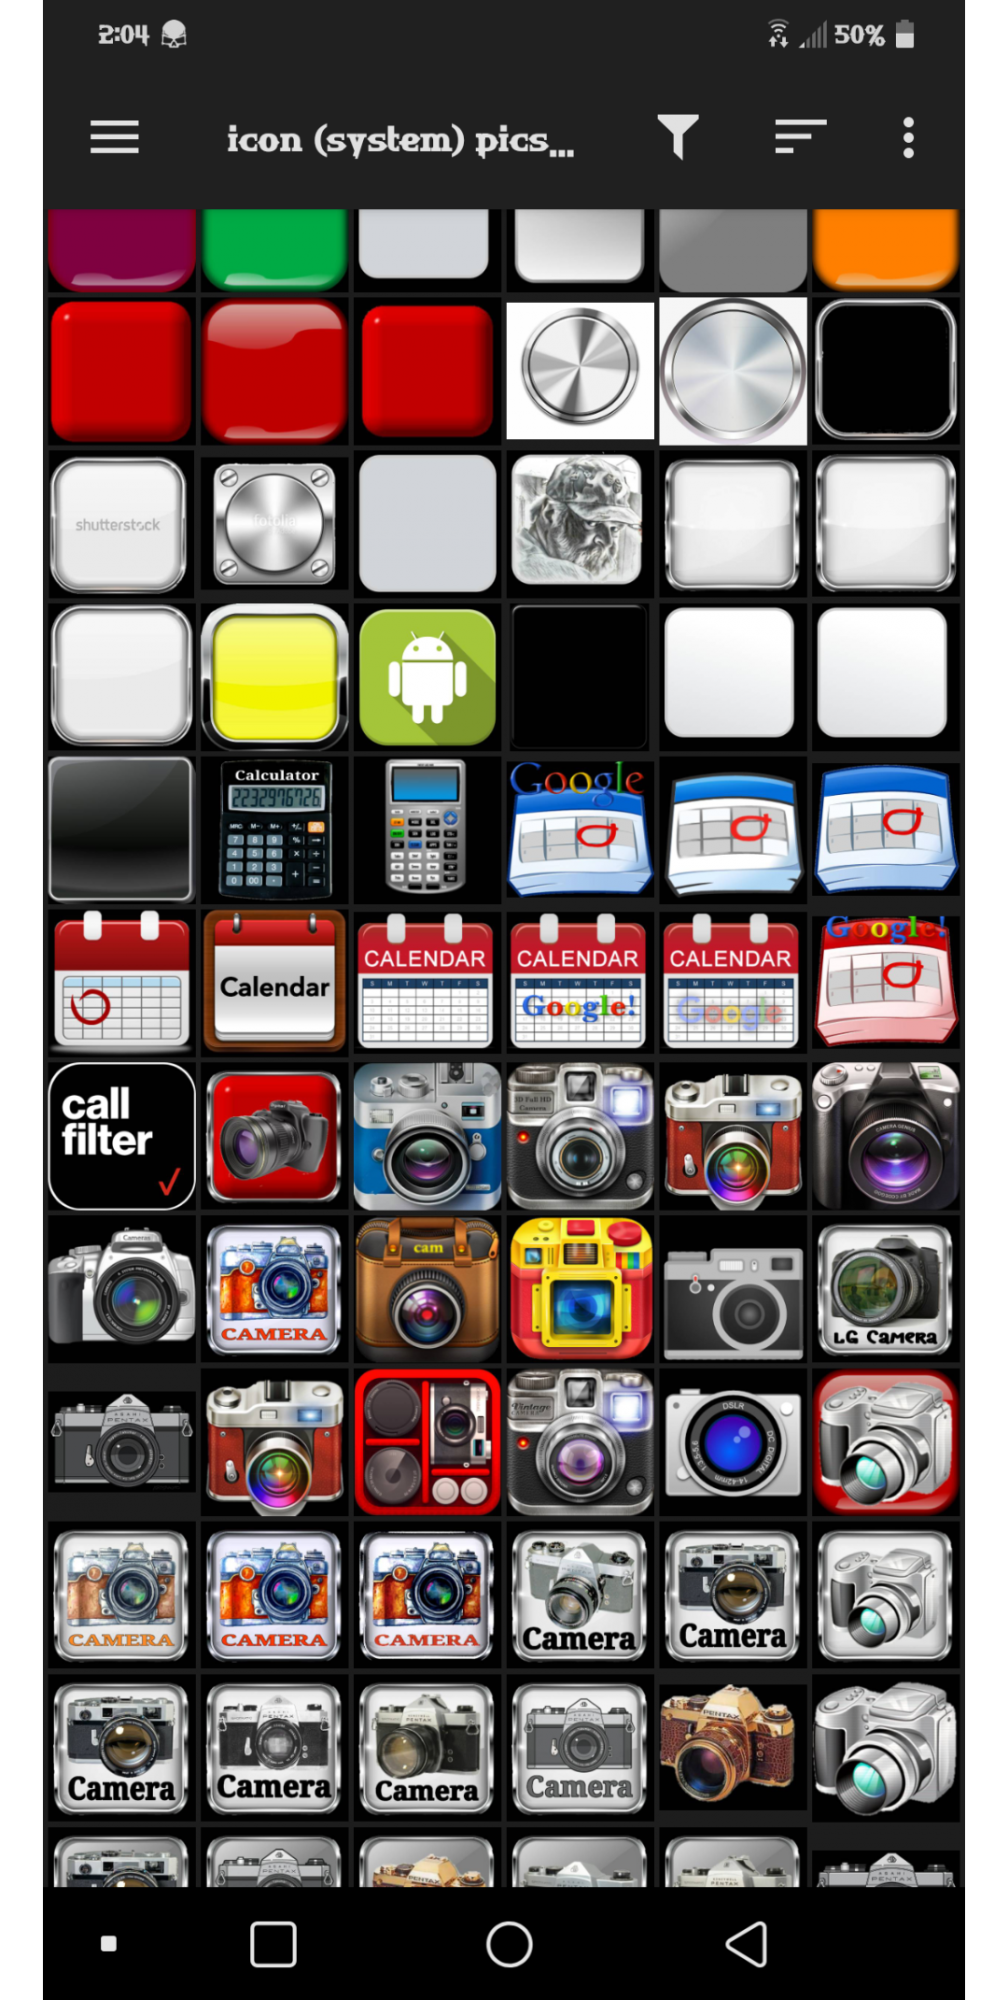 MyScreen_2019-12-01-14-04-00.png